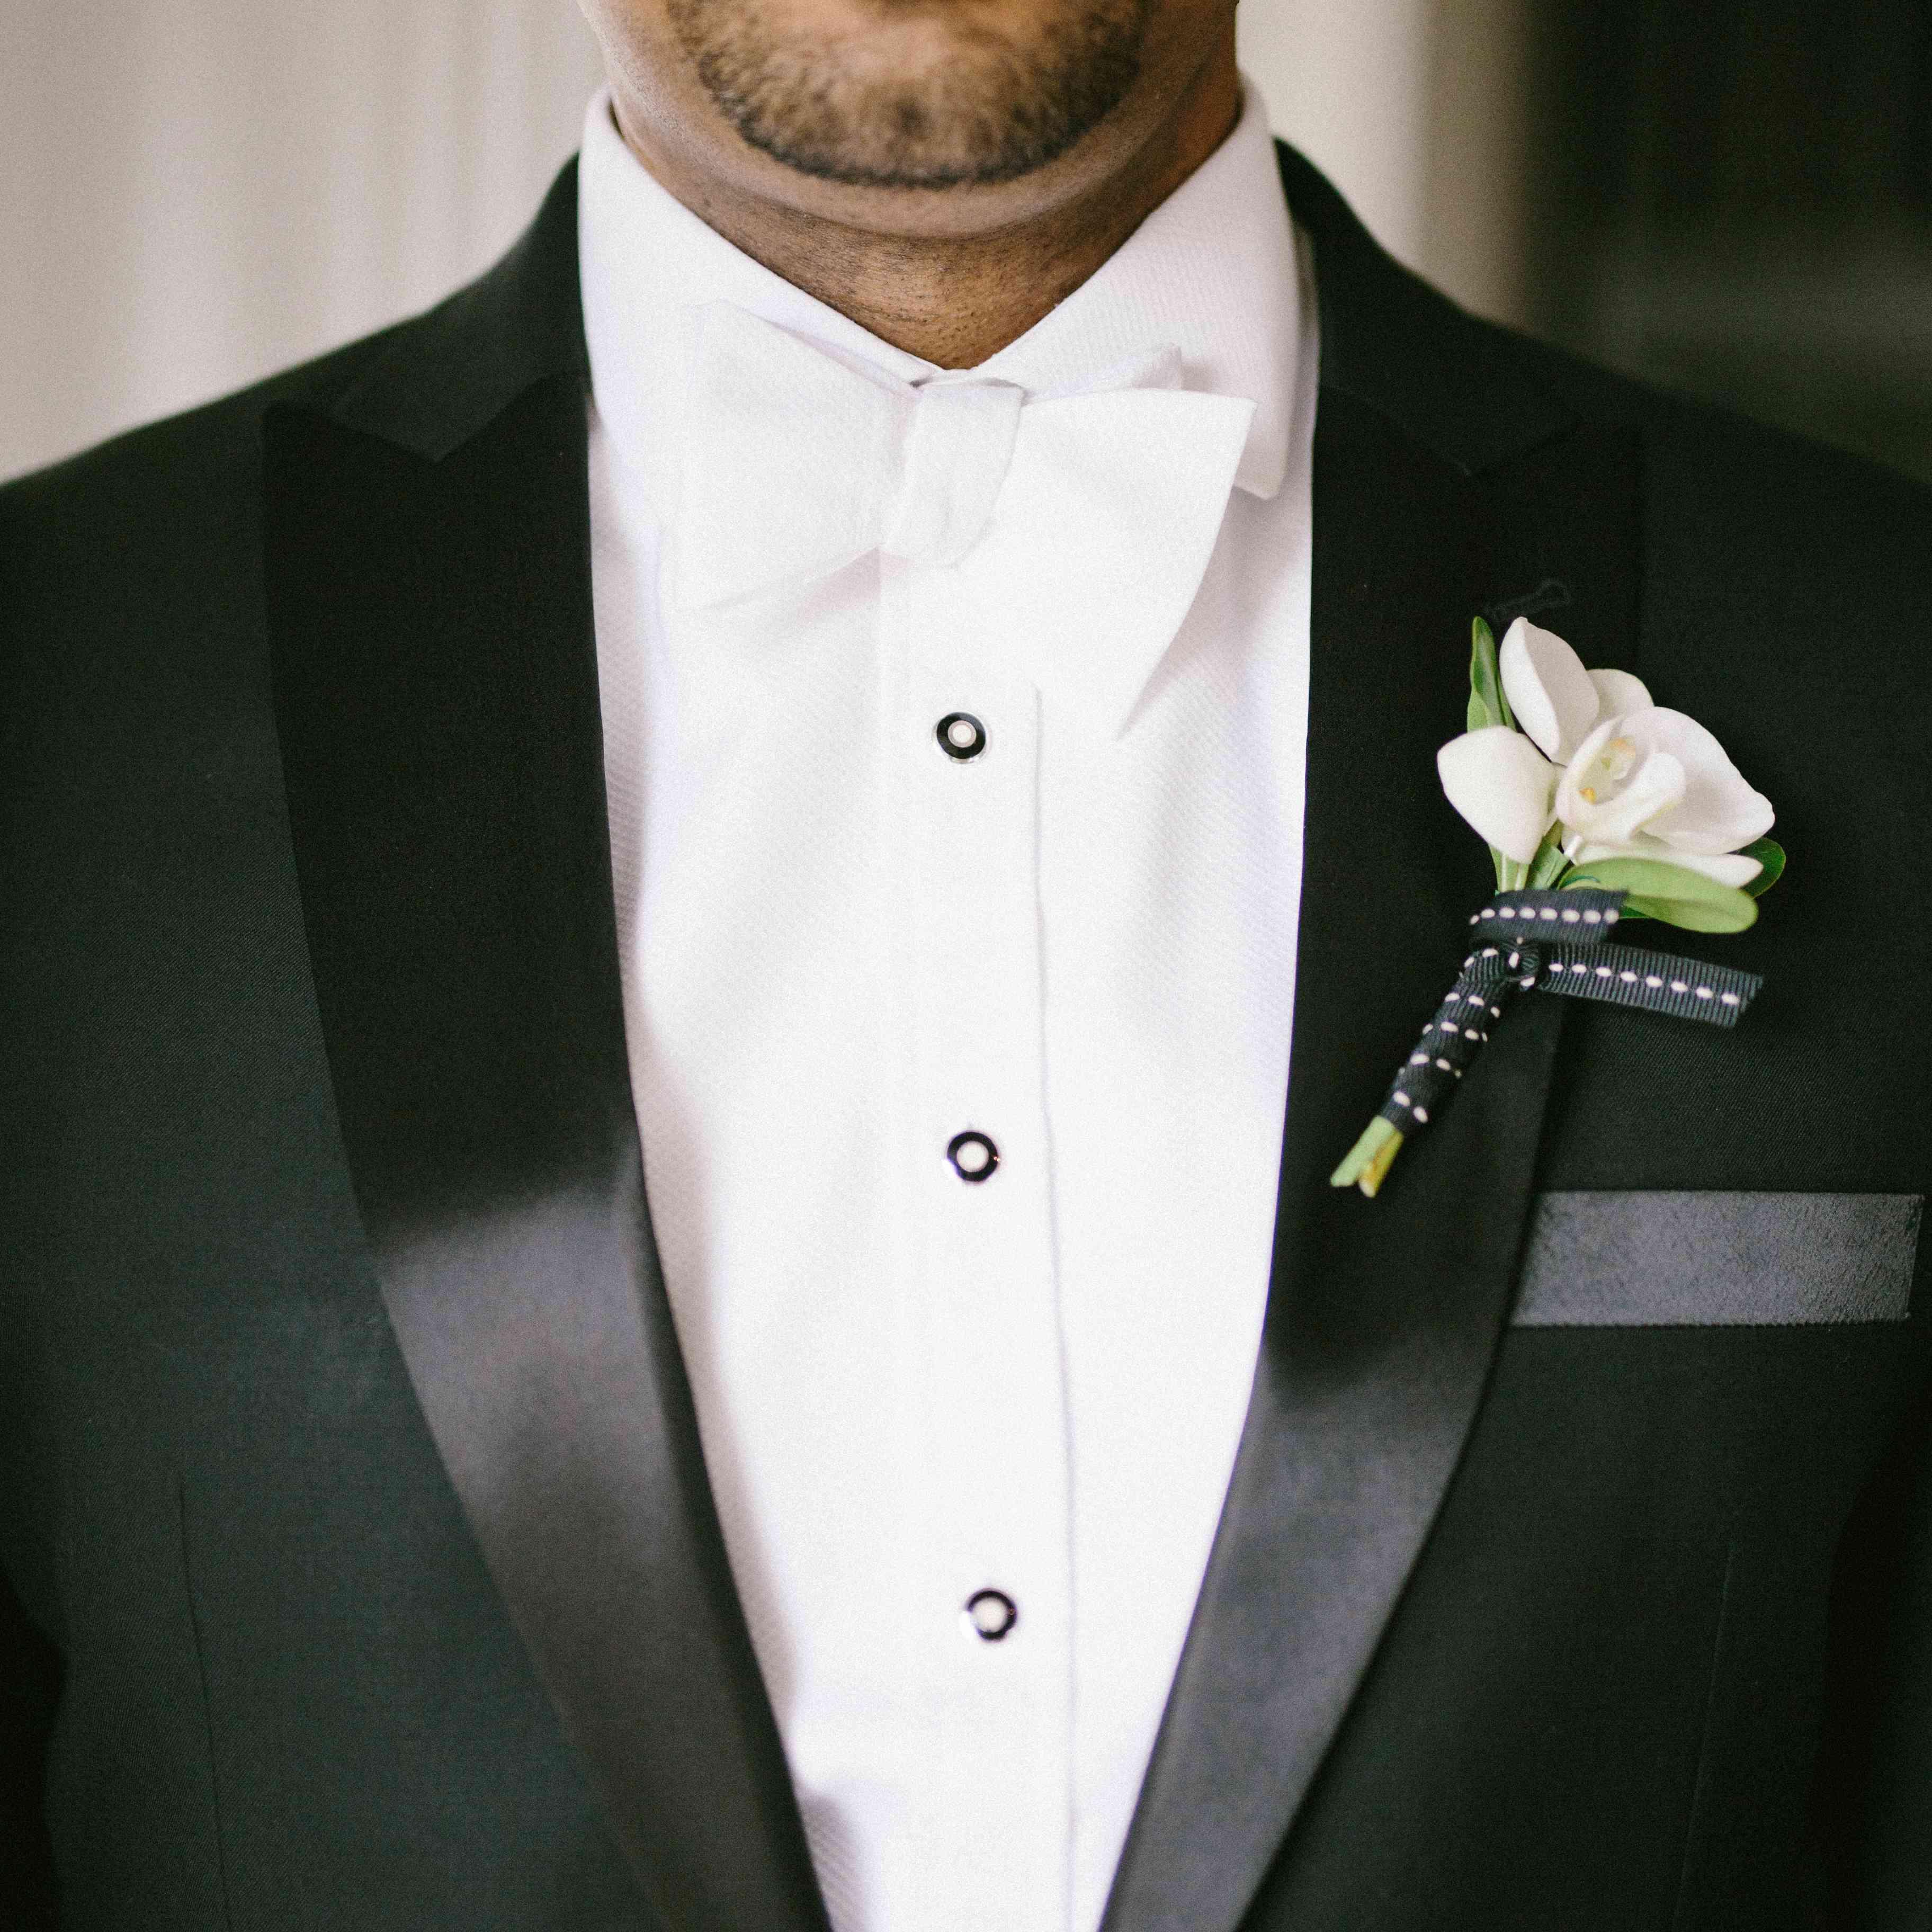 Groom in Black Tux